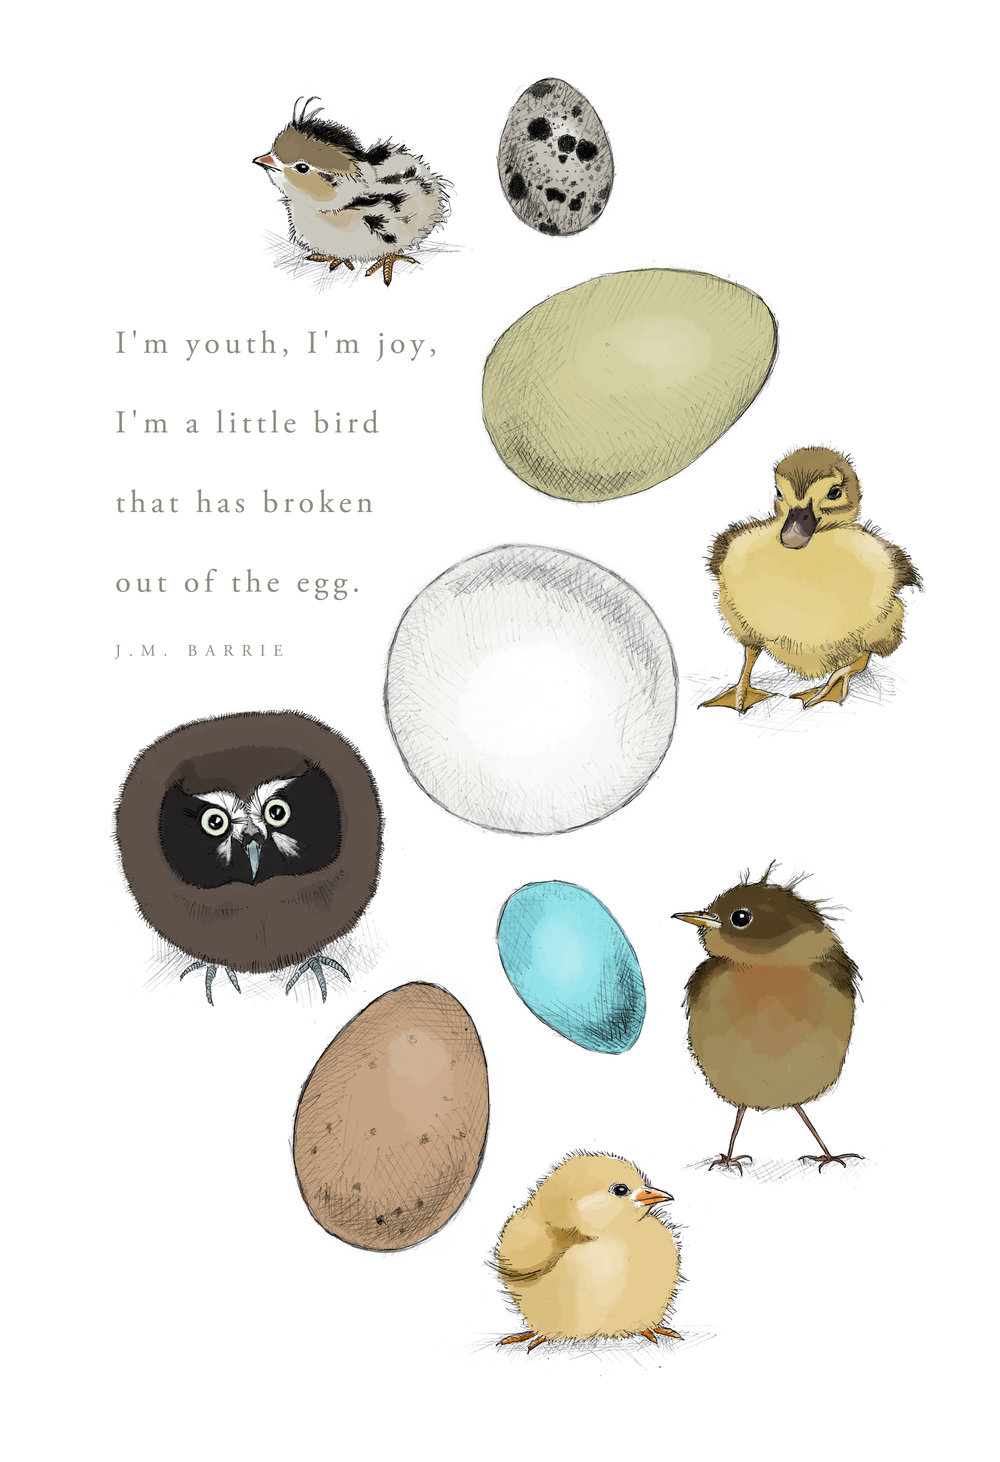 owl eggs are round!